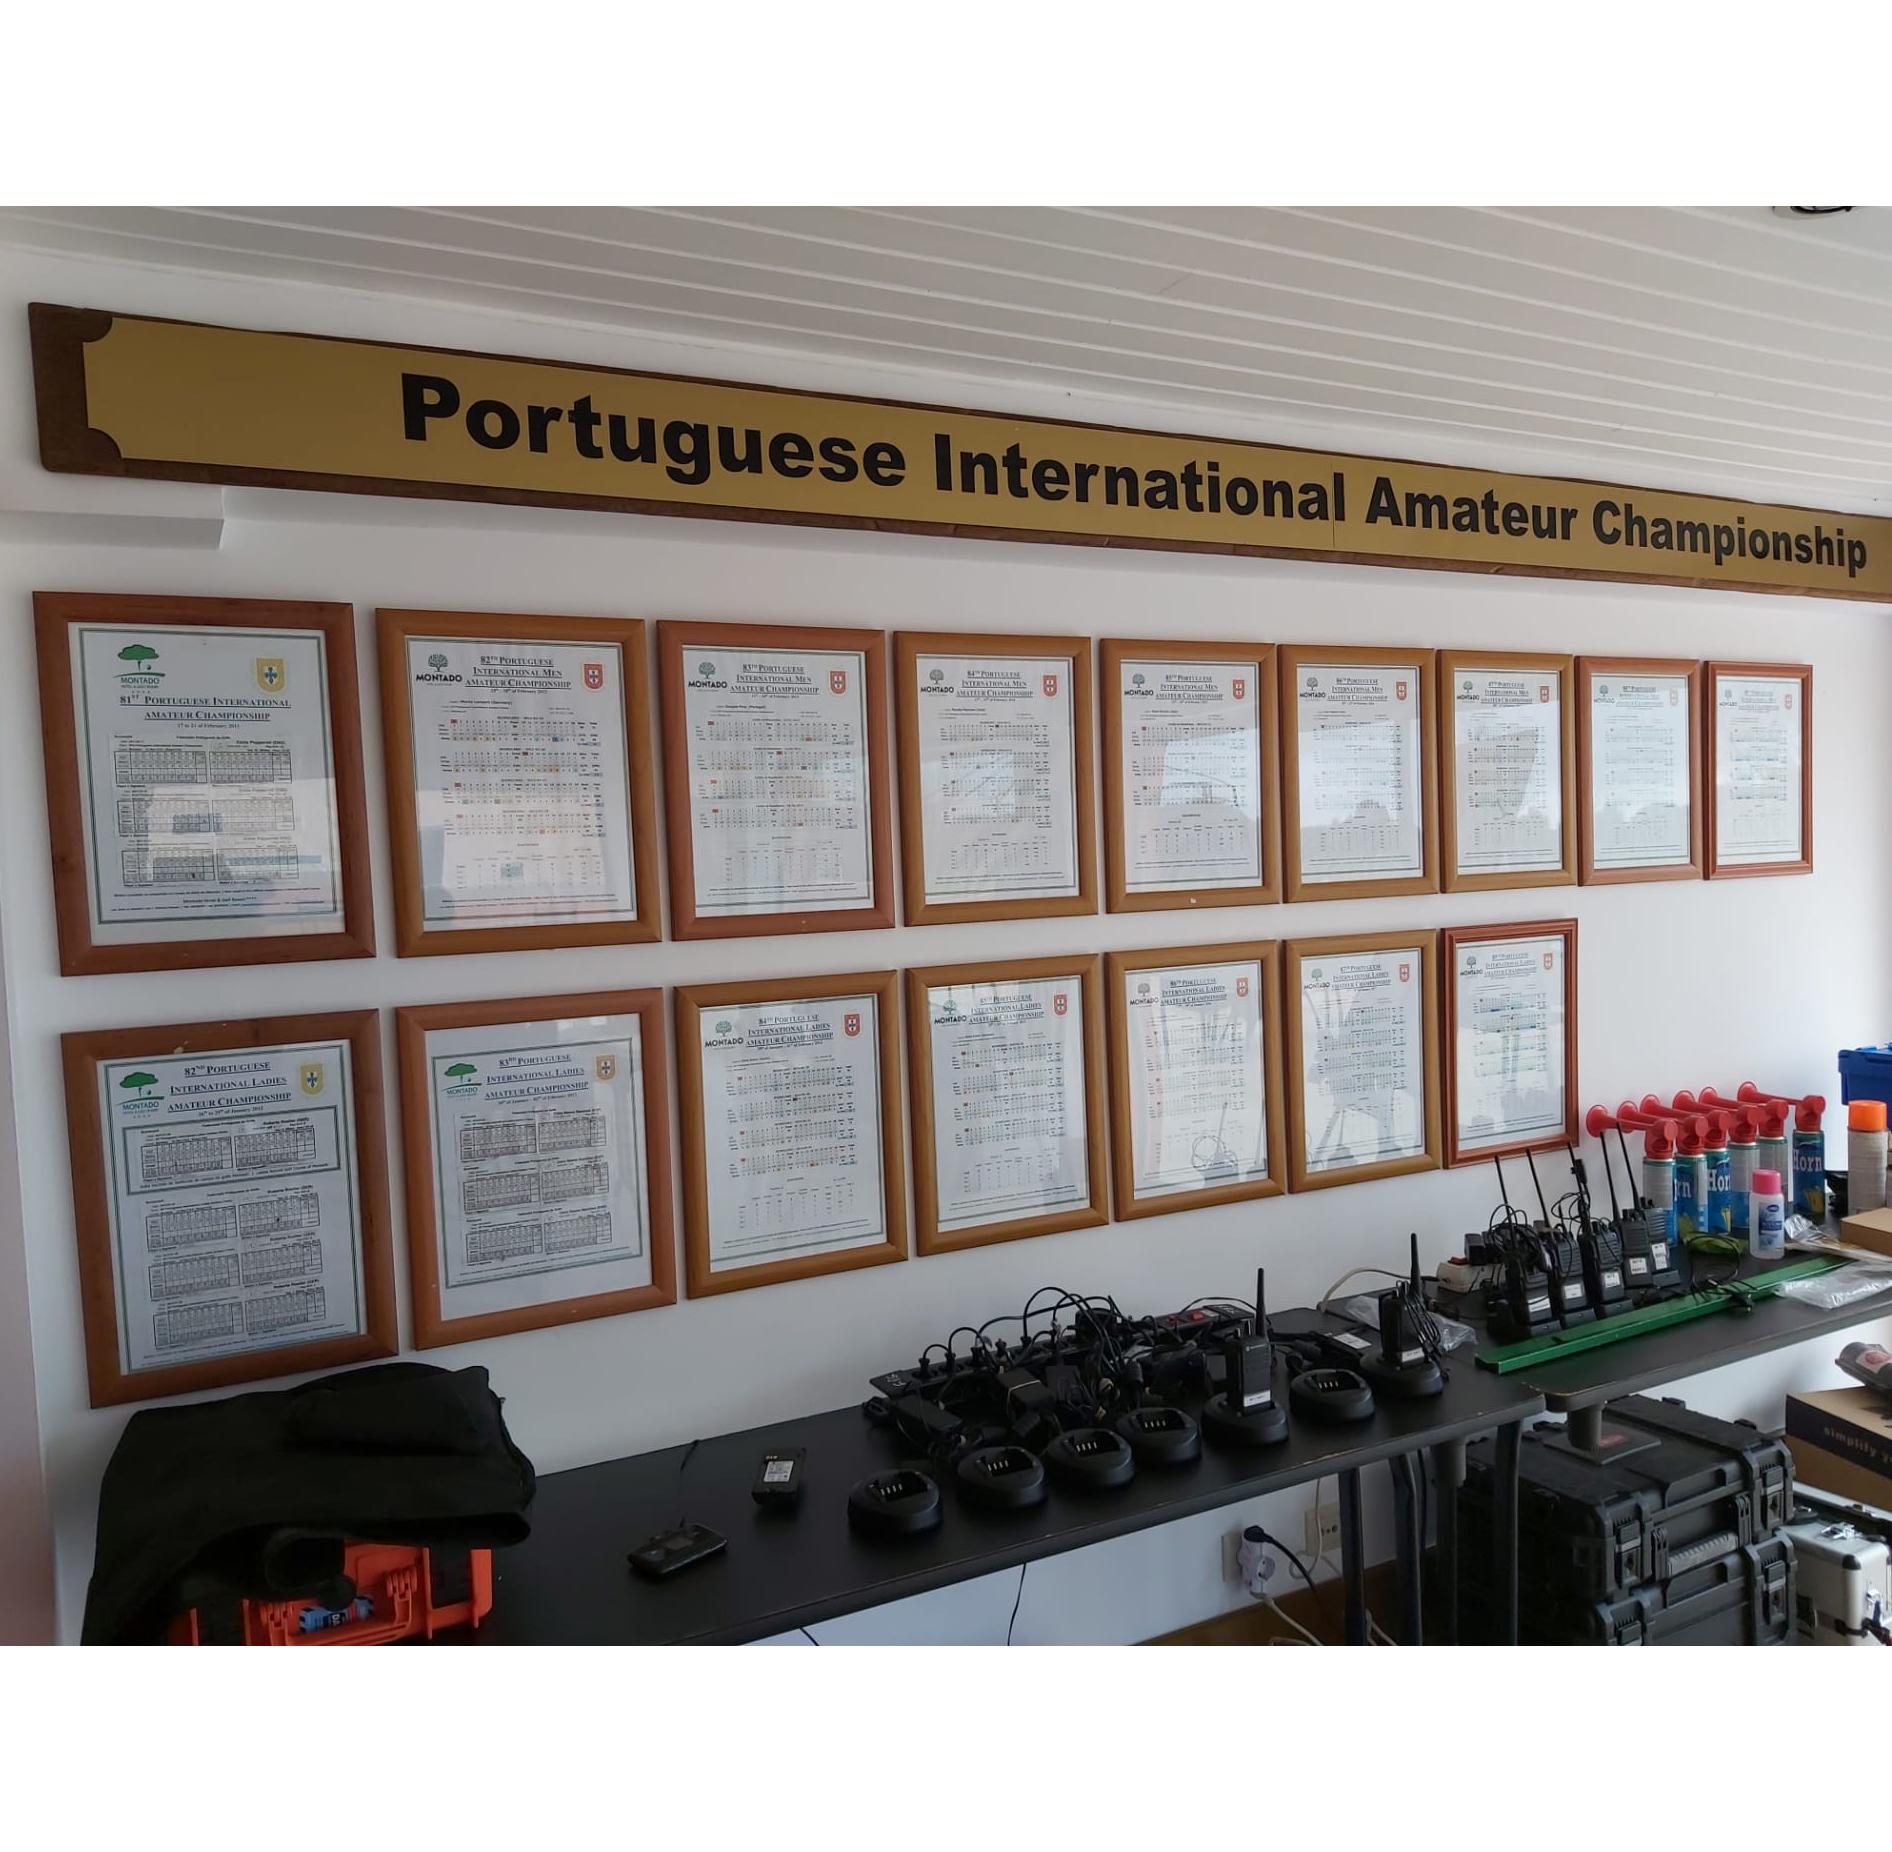 90th Portuguese International Amateur Championship – Moral e confiança em alta mas os pés assentes na terra